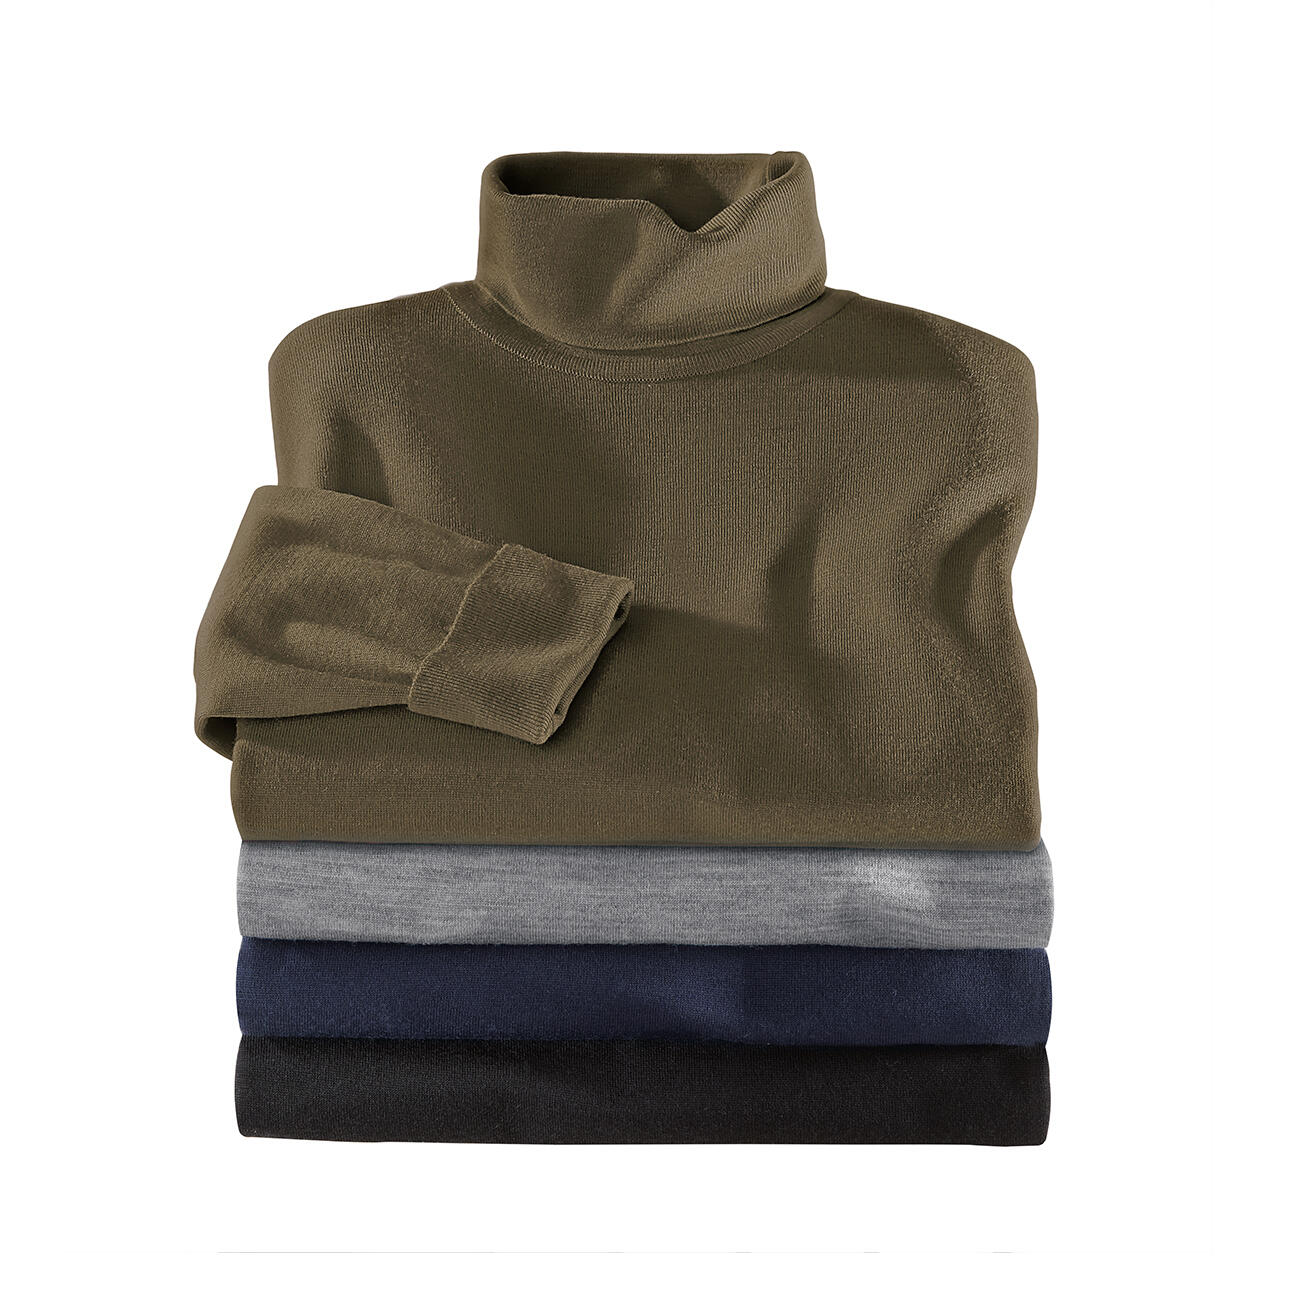 a3a9aa81f8e John Smedley coltrui - Deze merino-pullover van John Smedley weegt minder  dan 300 gram